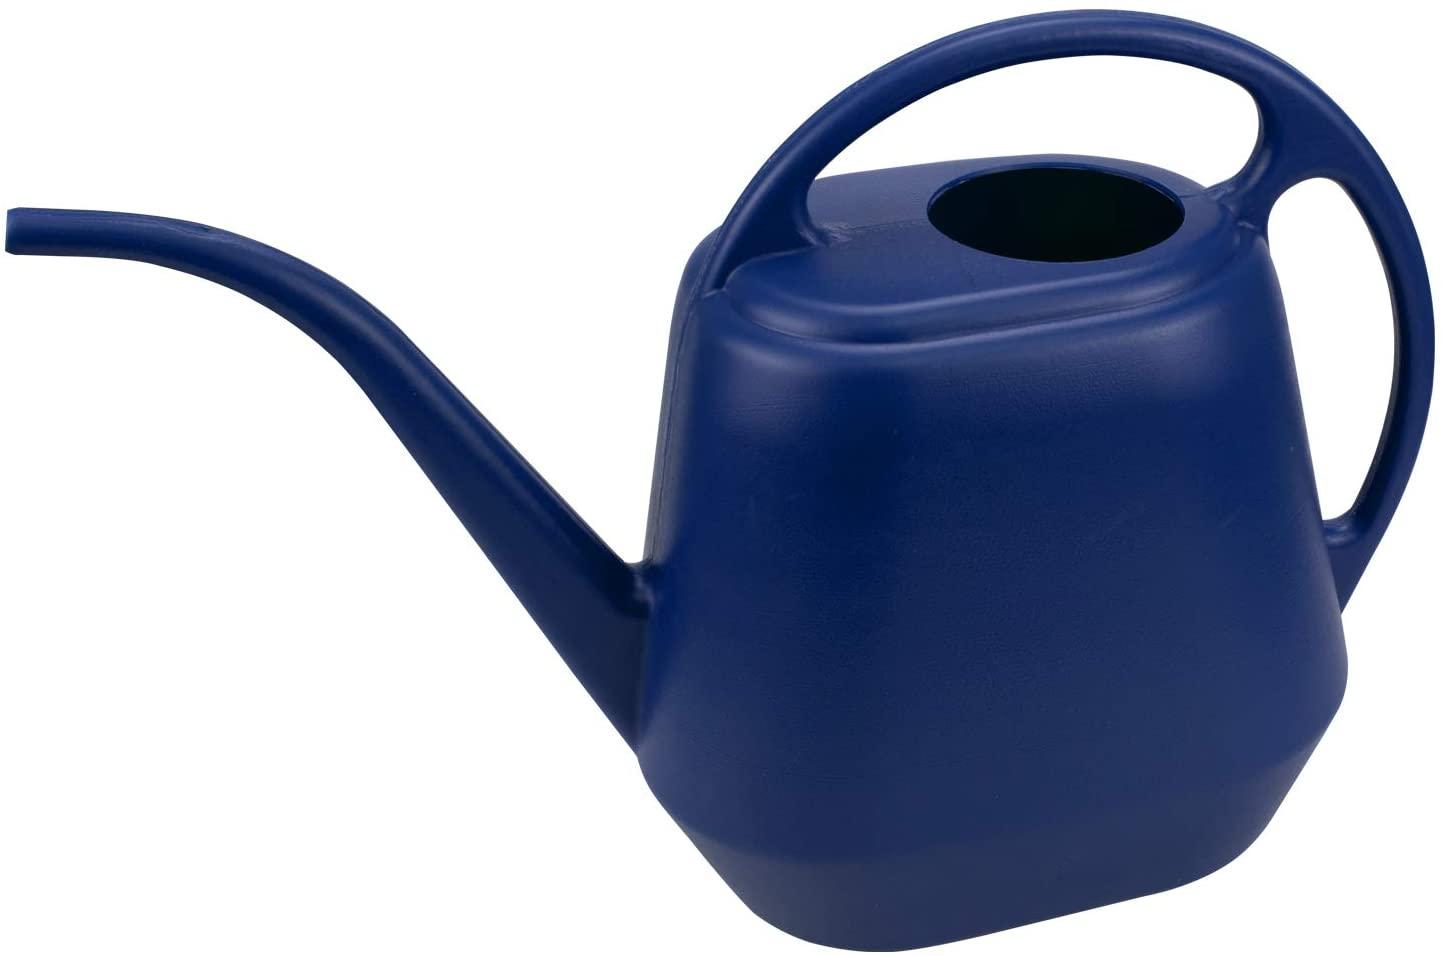 Fasmov Plastic Watering Can, 1-Gallon, Blue